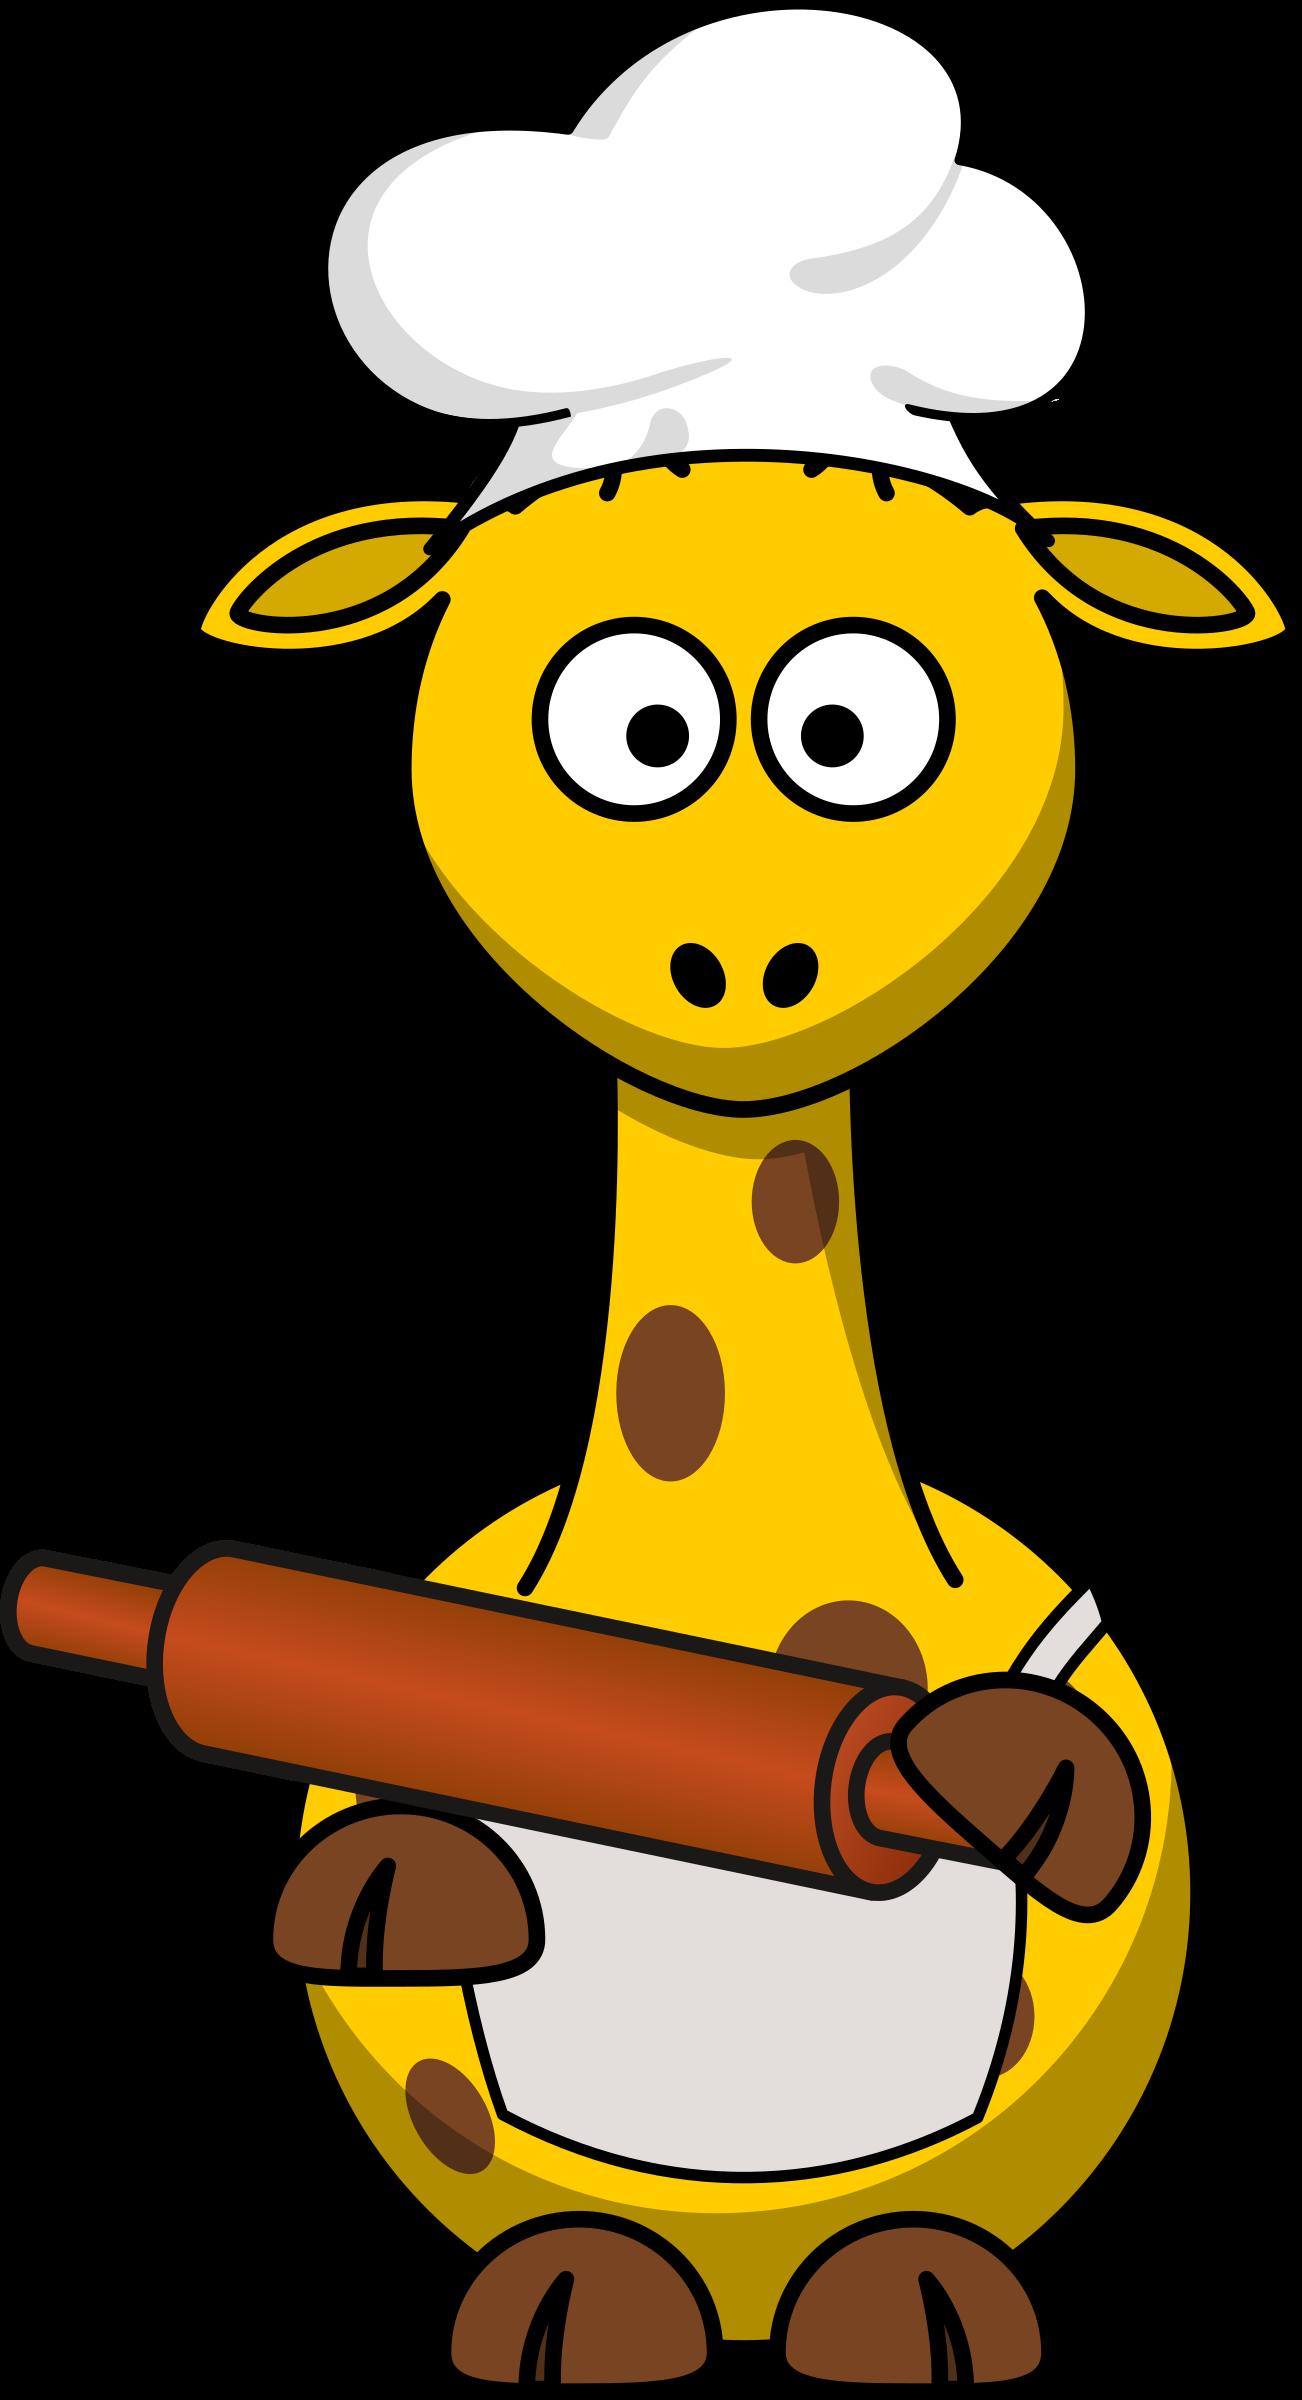 HD Giraffe Big Image Png.